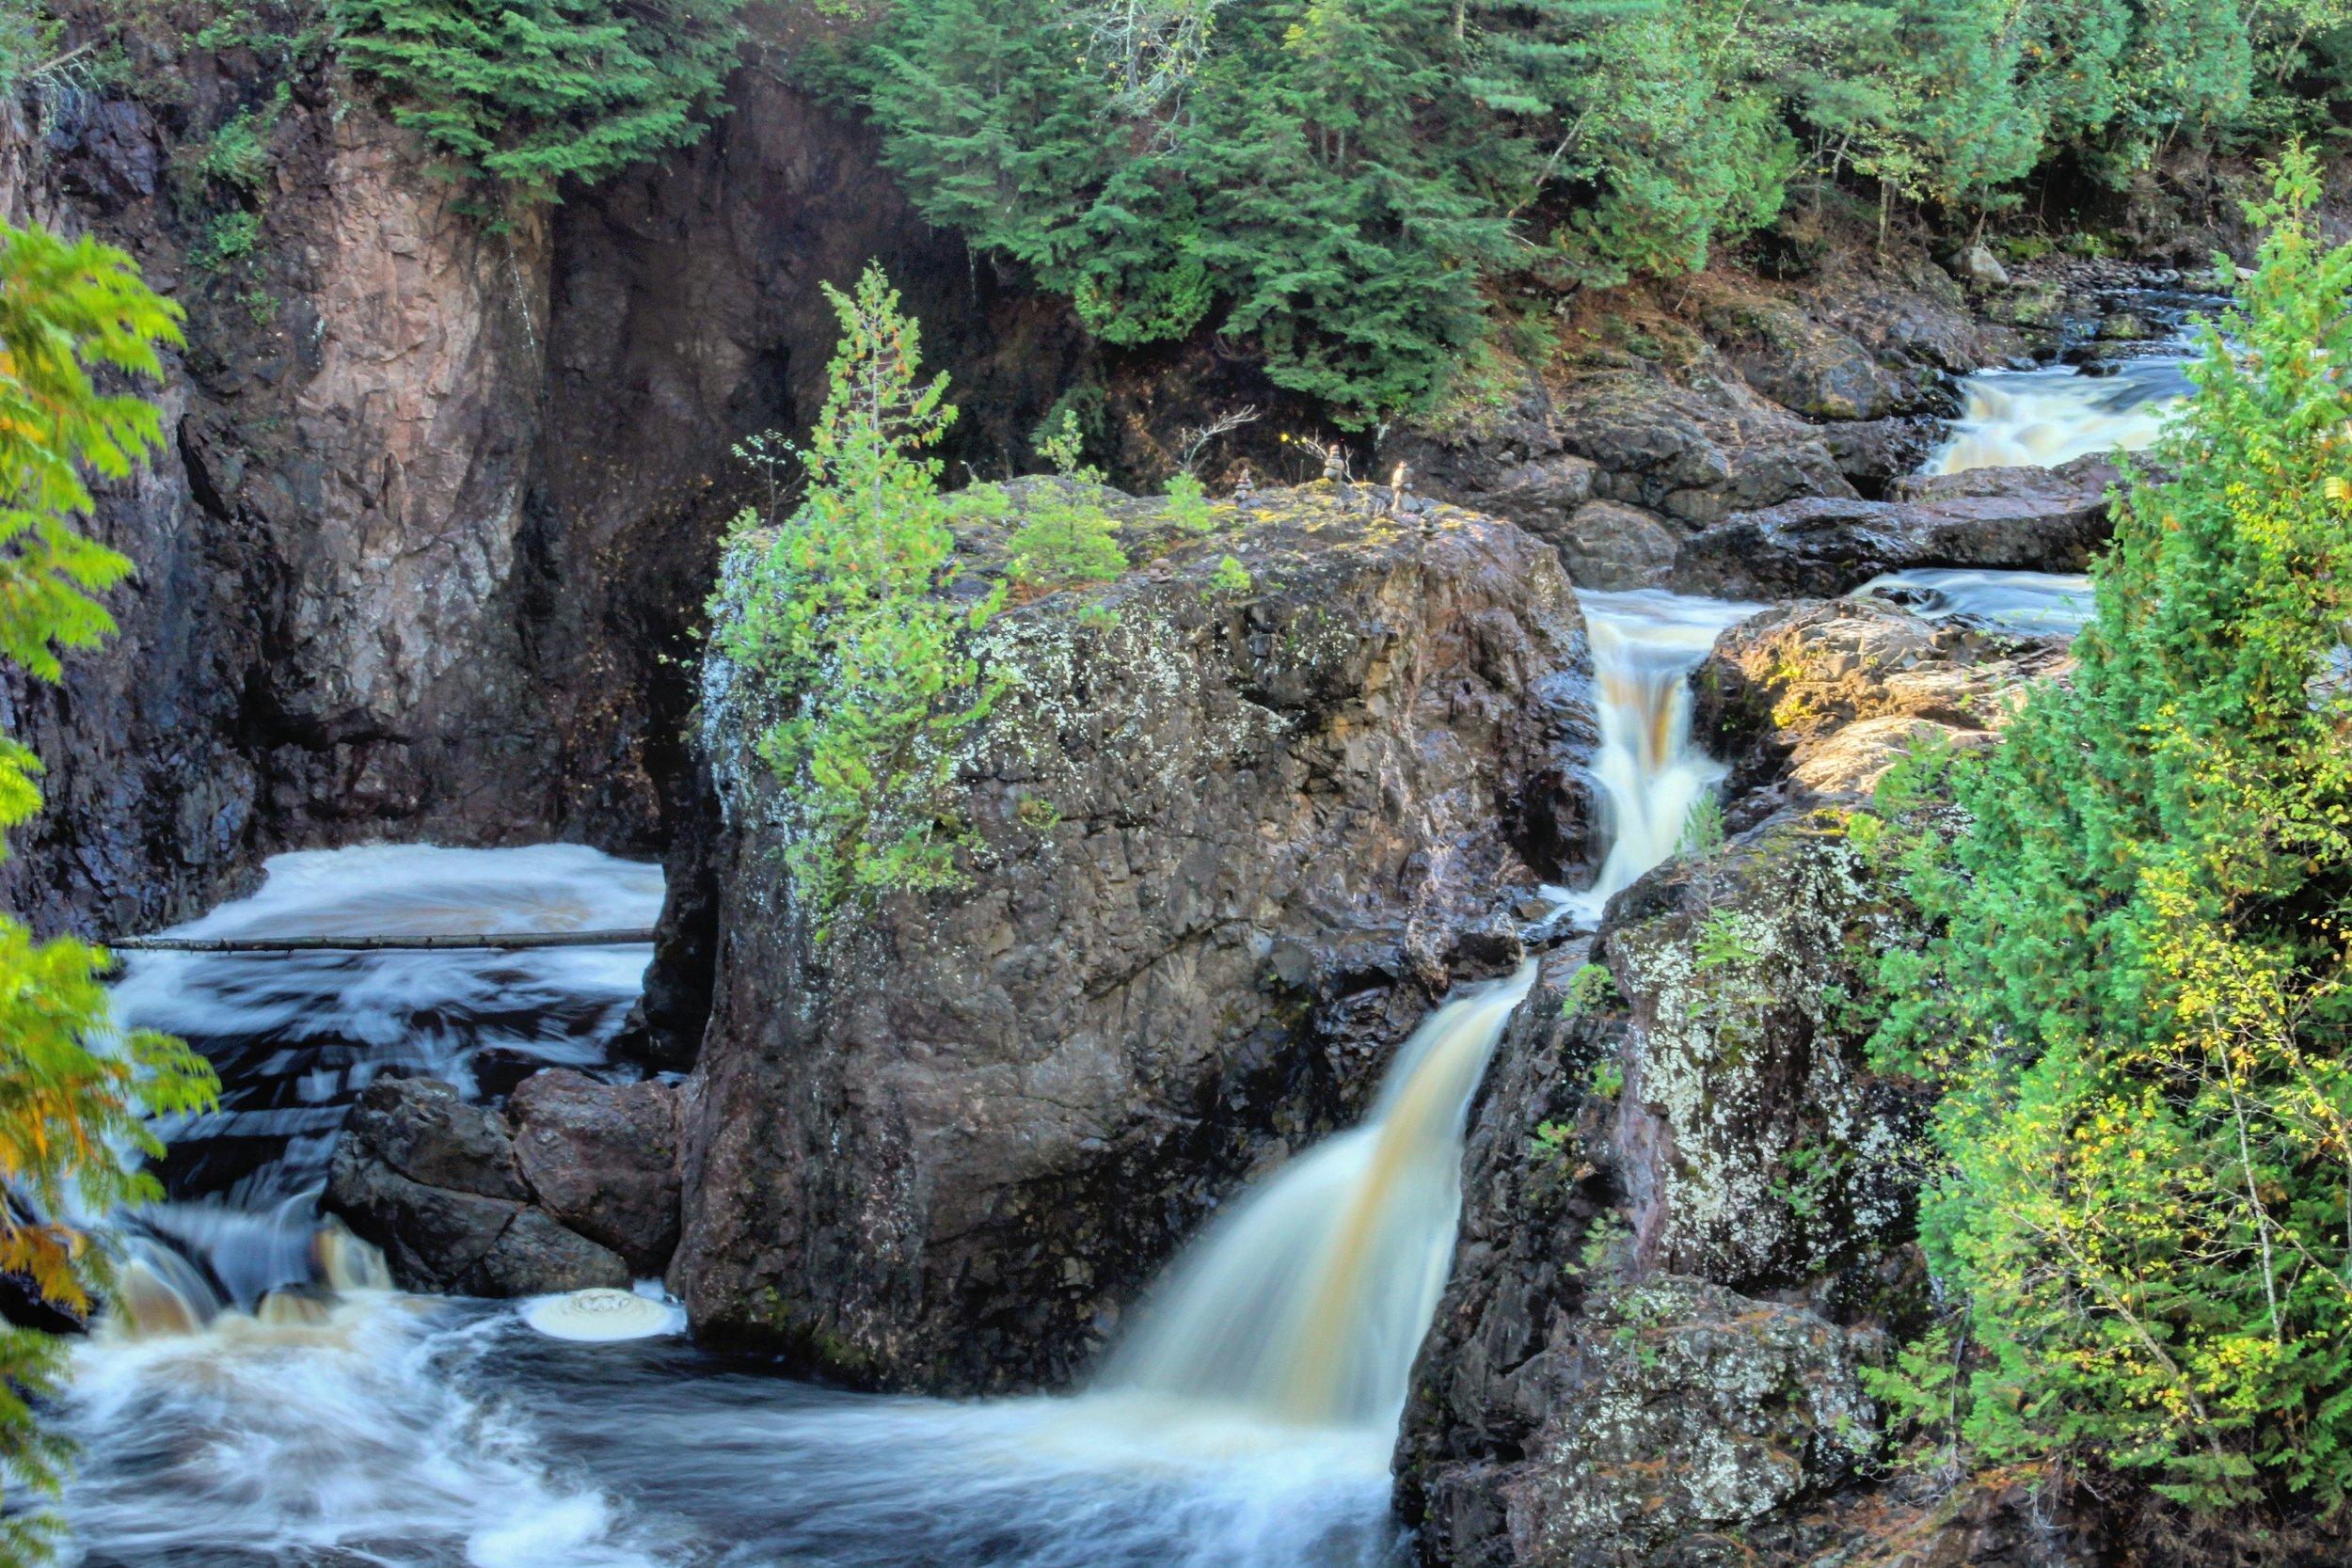 Copper Falls State Park, Mellen, Wisconsin.